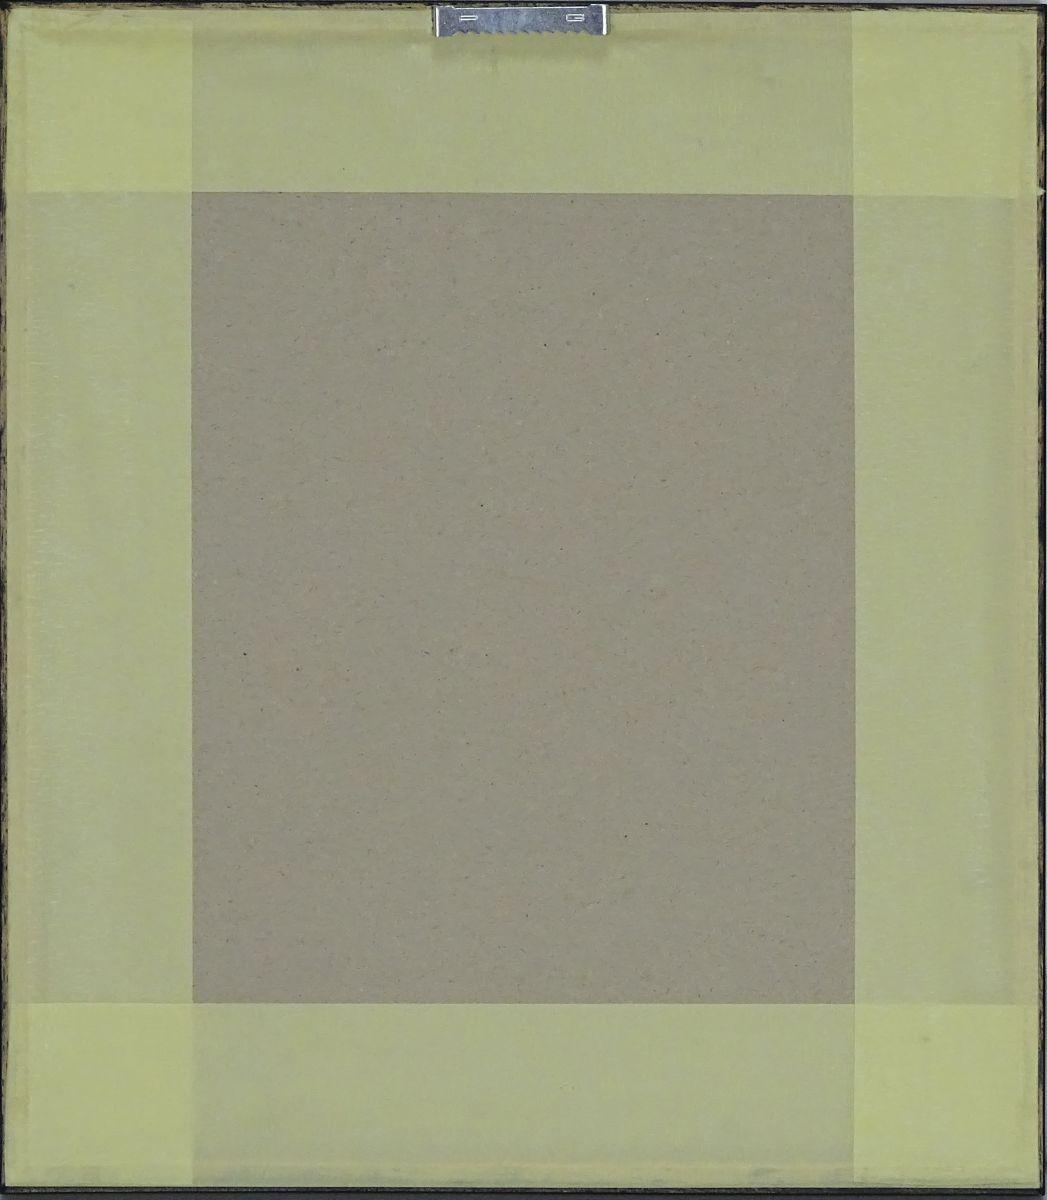 DSC03600.JPG (1047×1200)